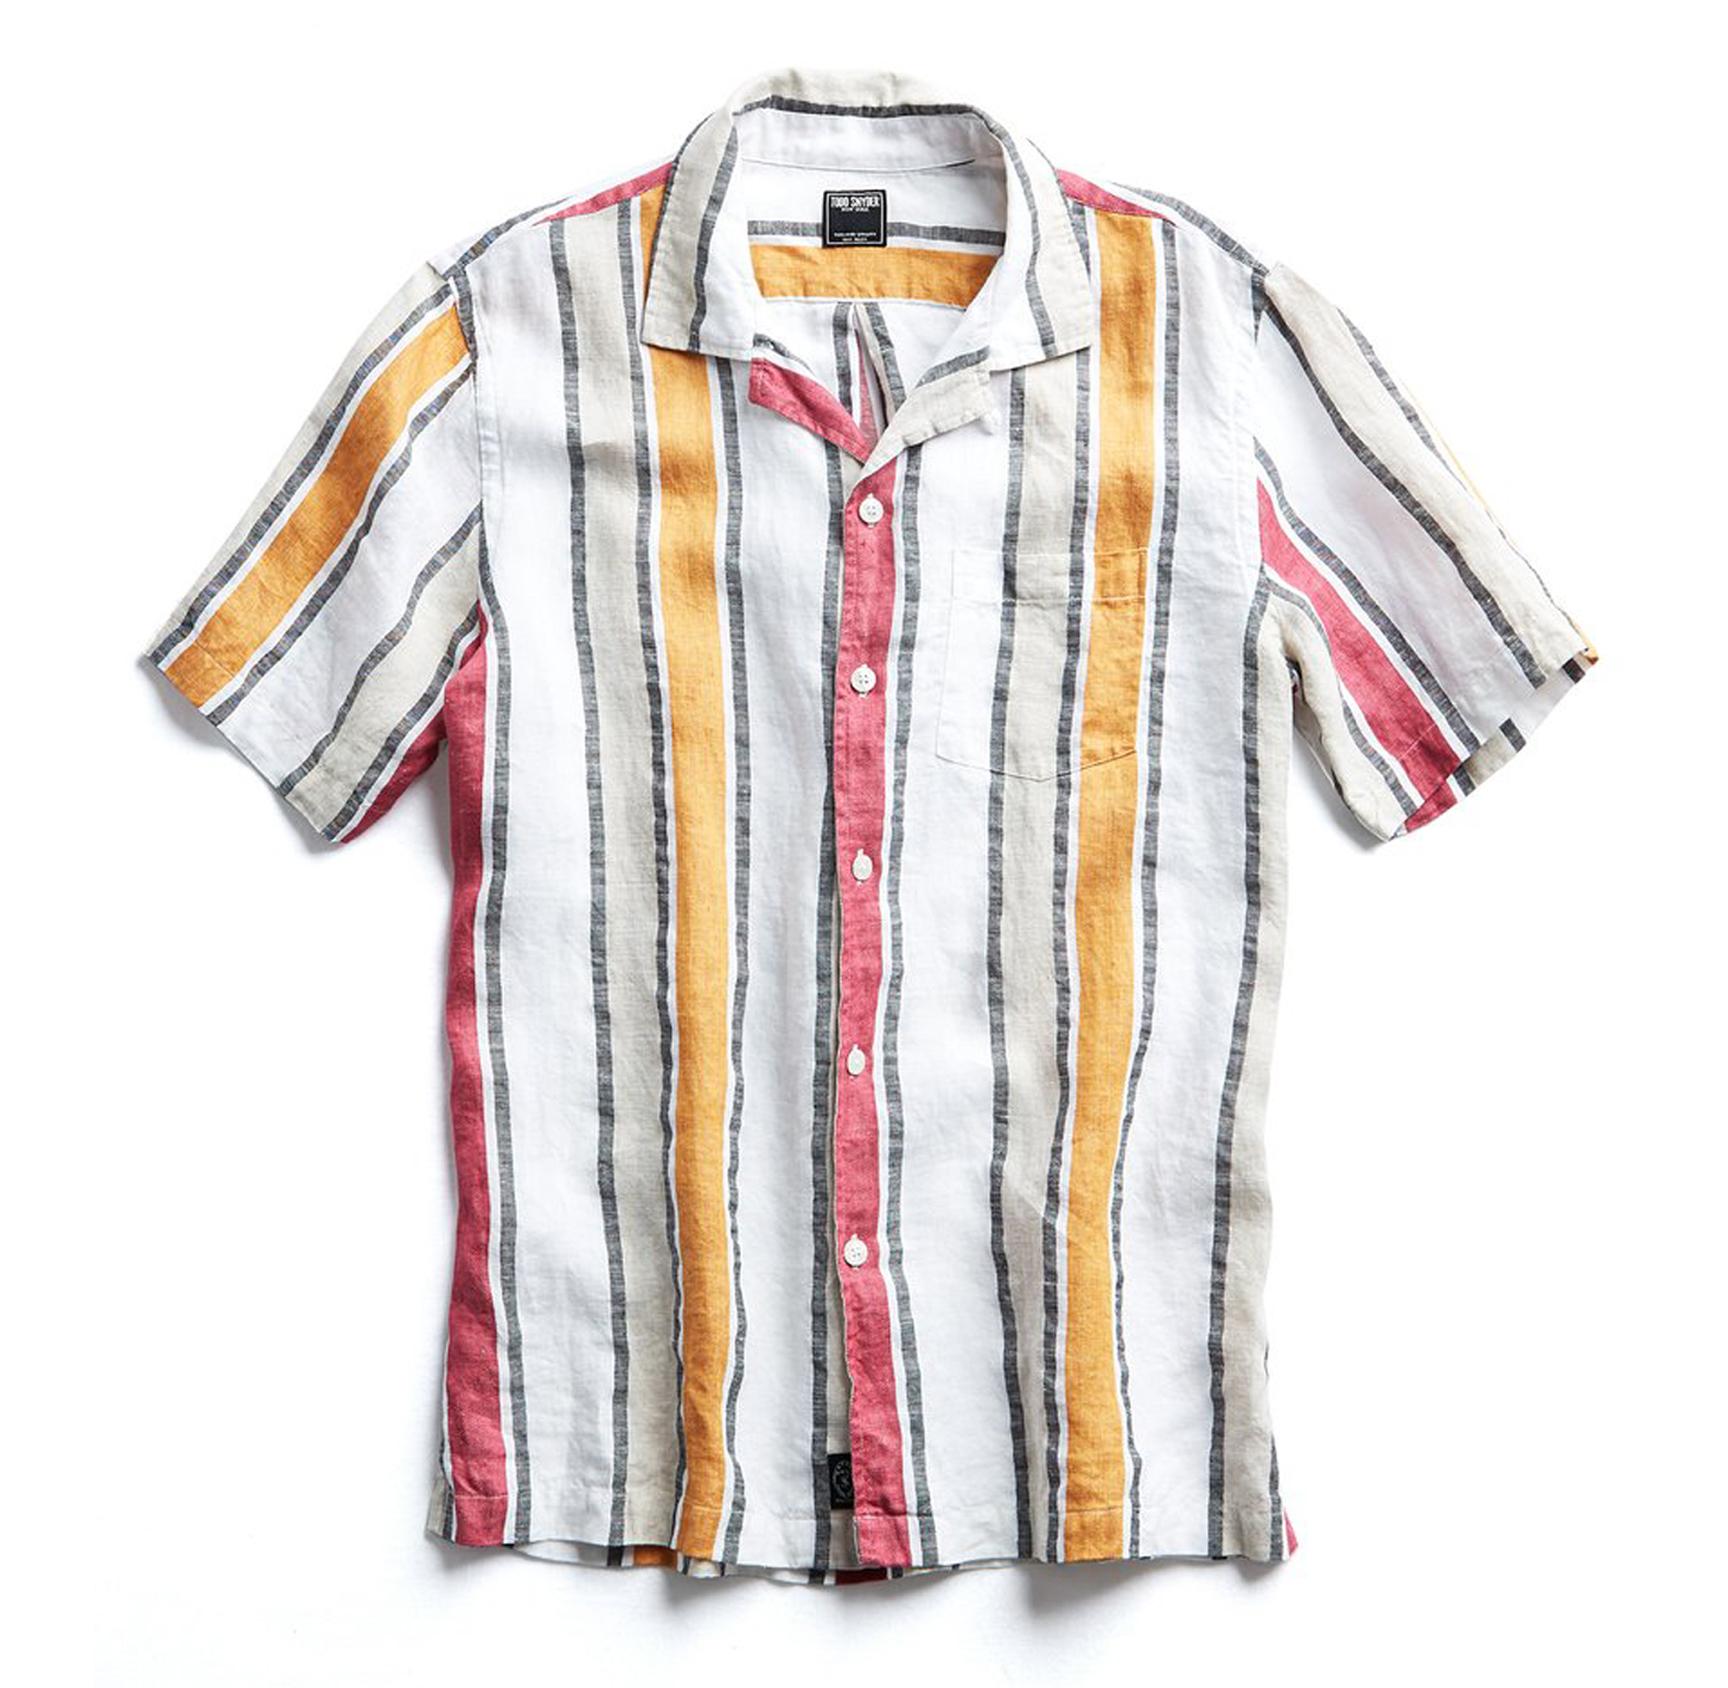 Tom Snyder striped shirt